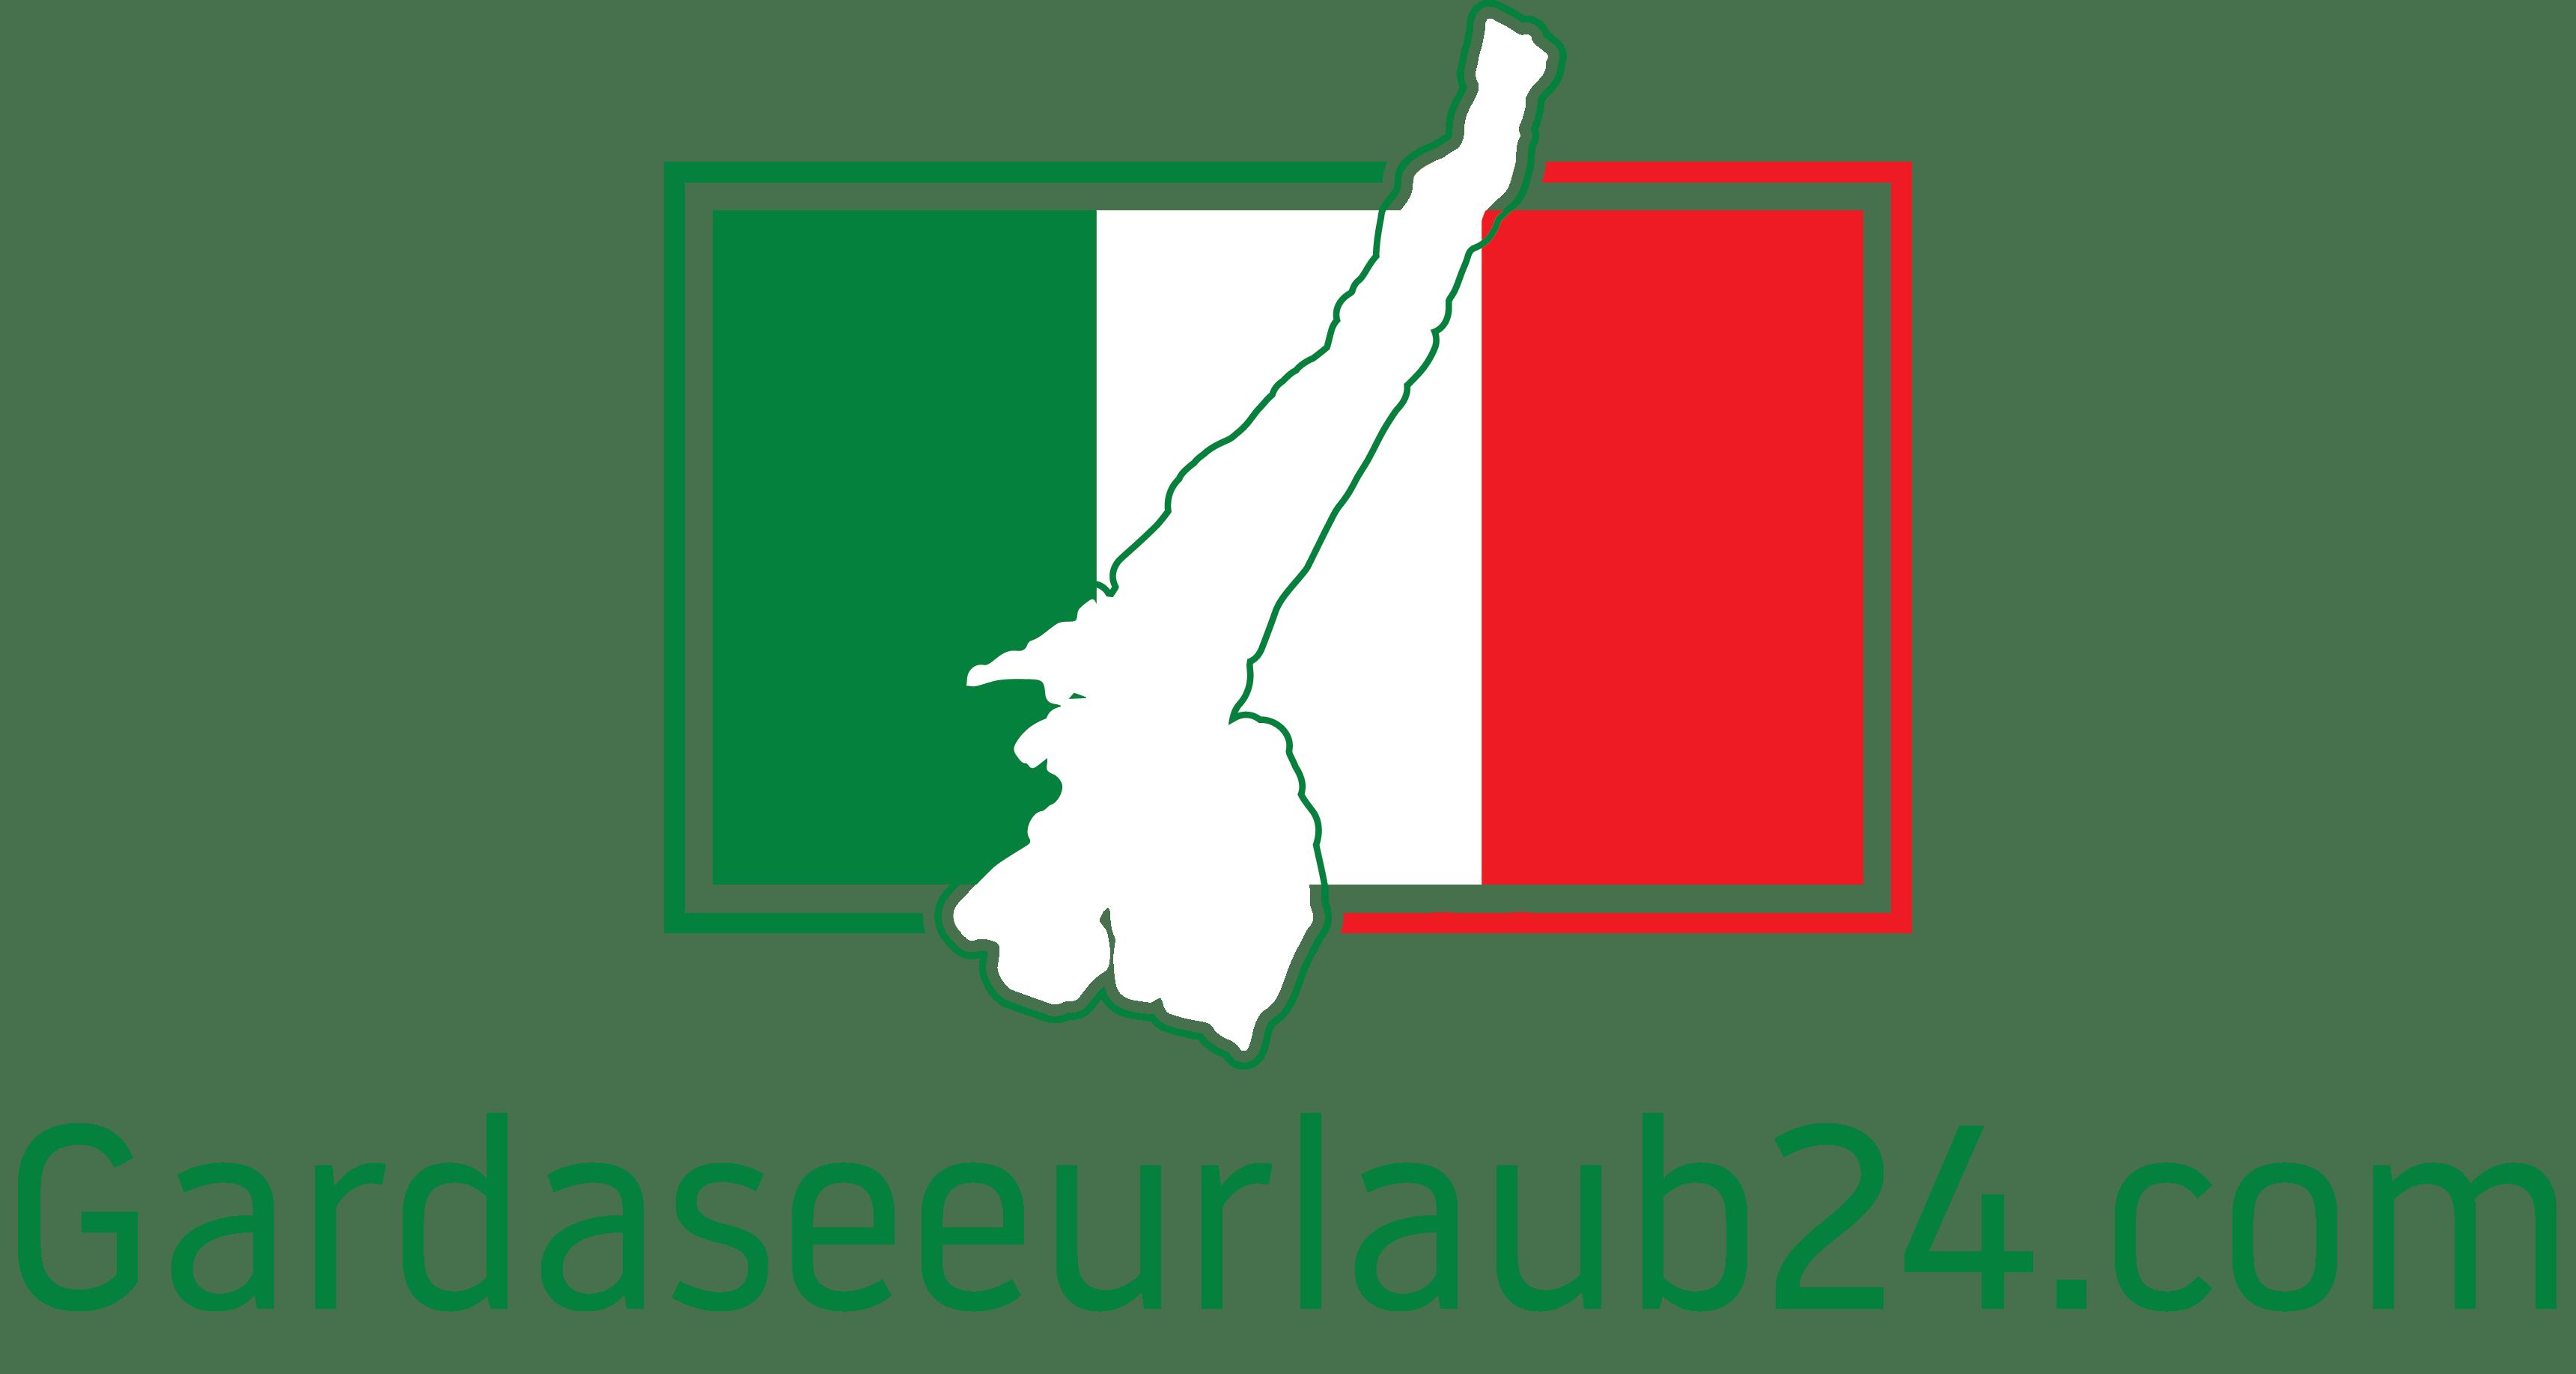 Gardaseeurlaub24.com